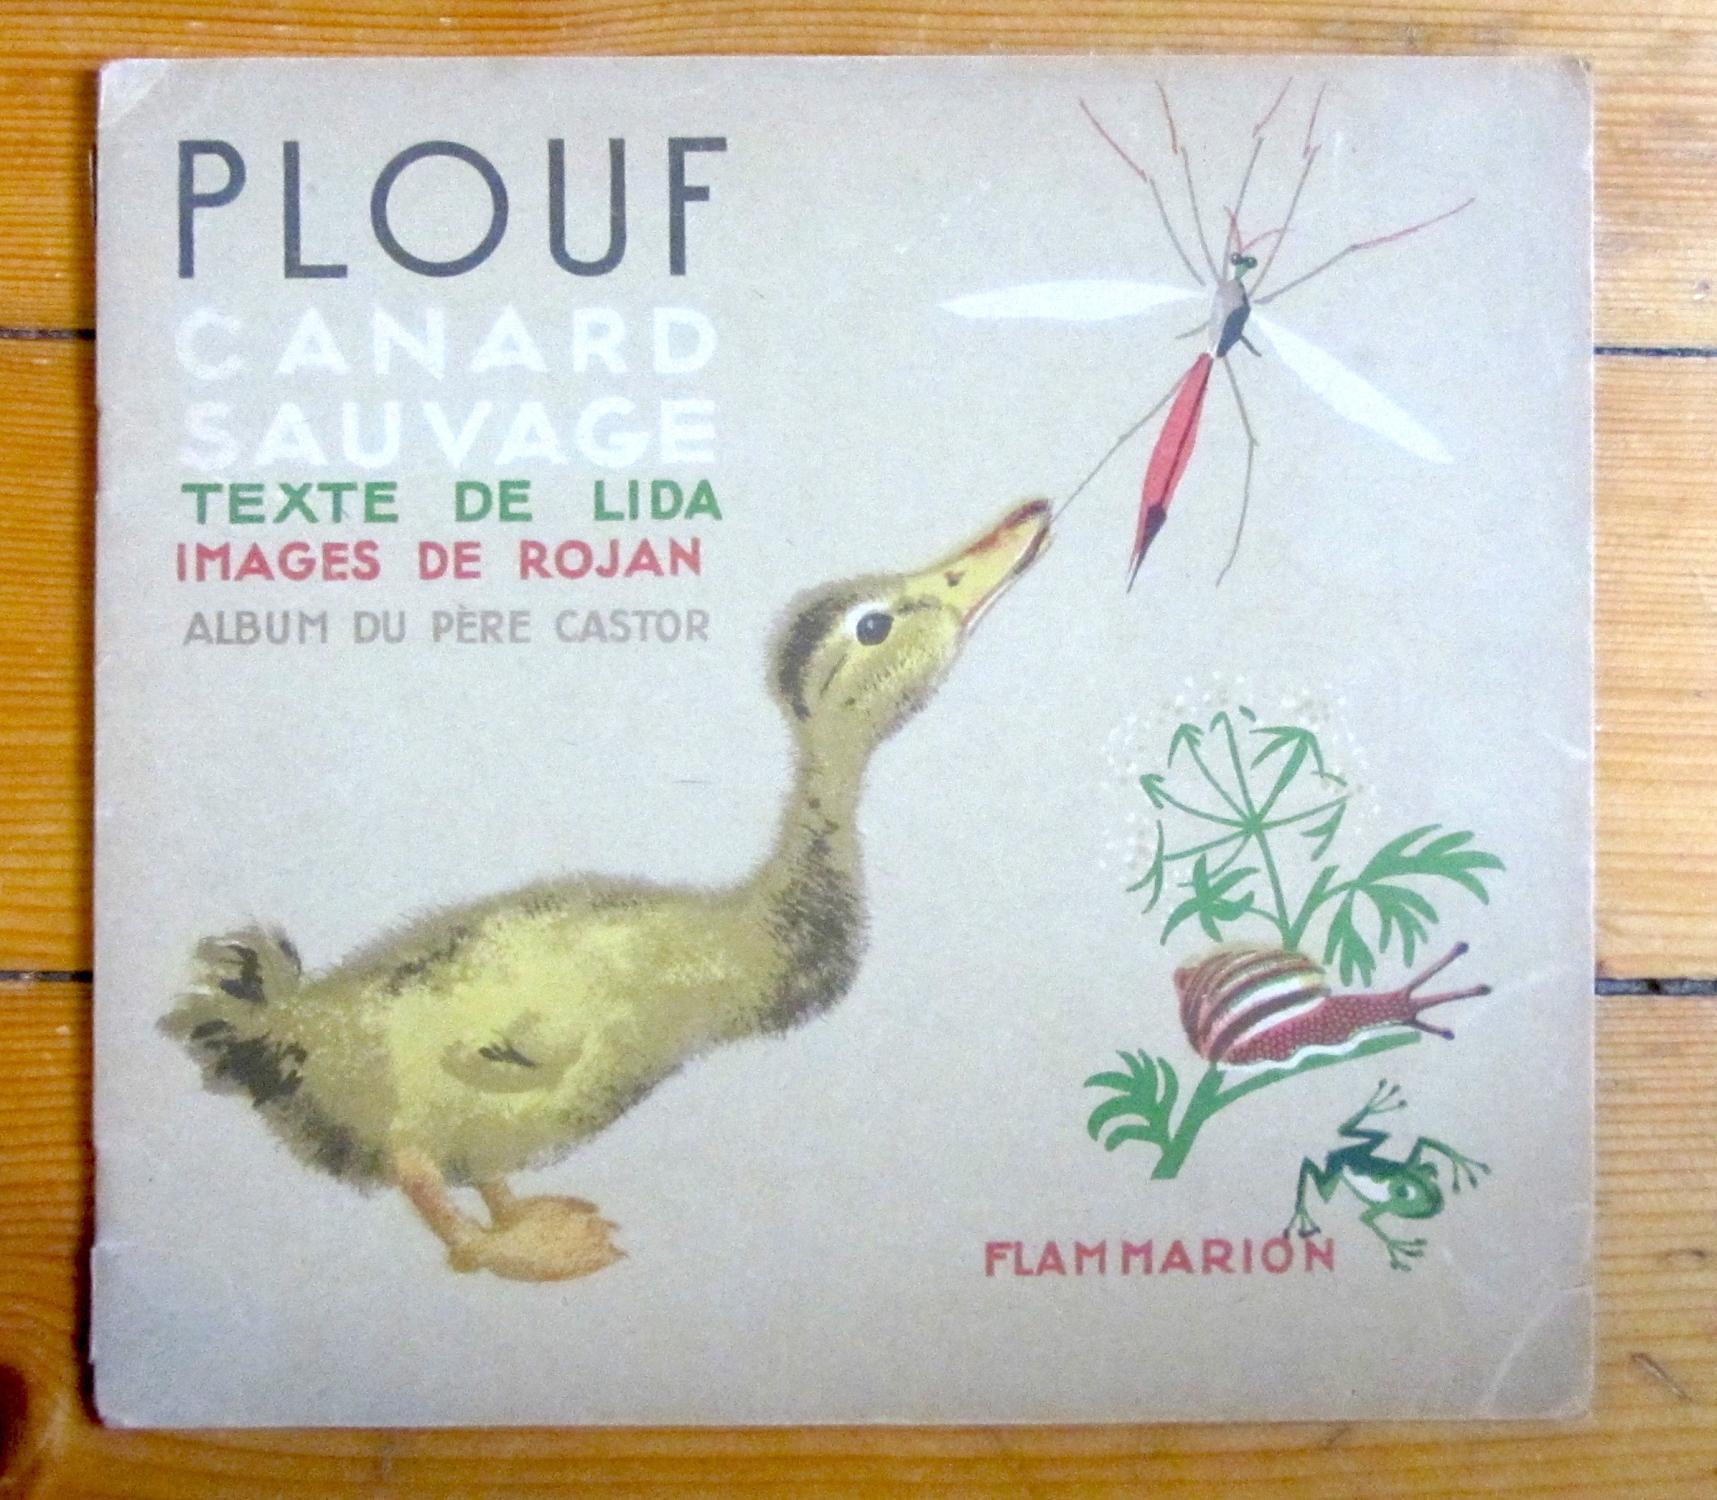 Plouf, Canard Sauvage intérieur Album Plouf